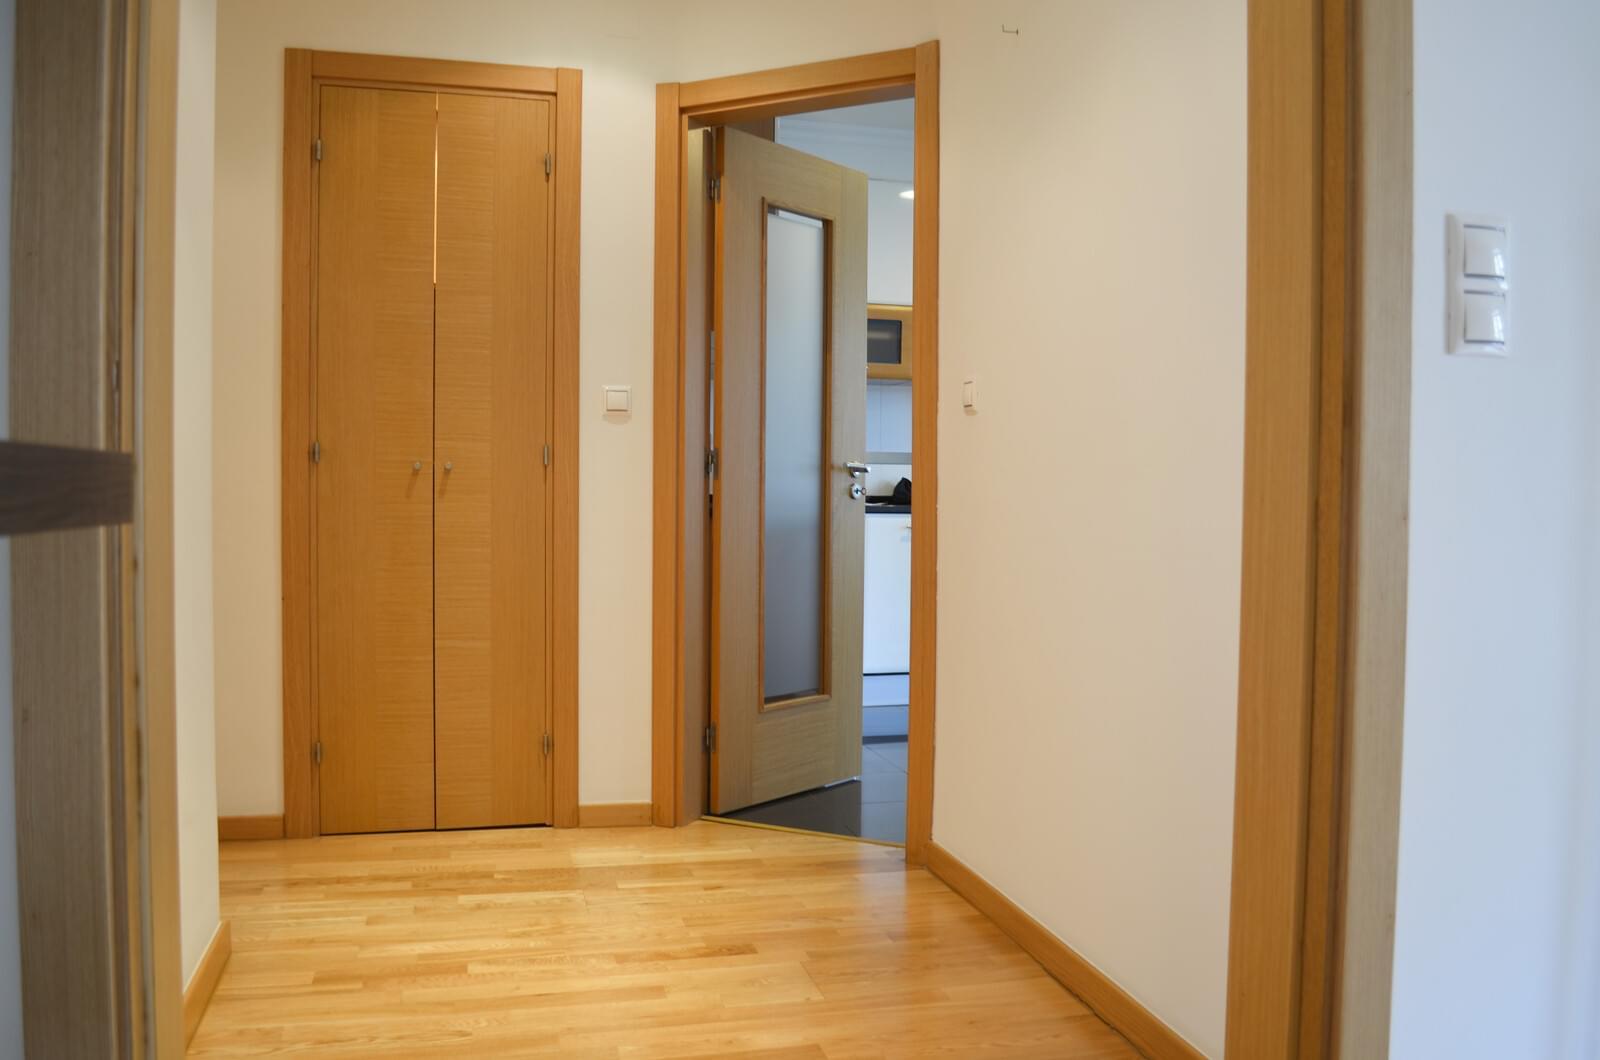 pf18839-apartamento-t2-lisboa-6cfe5f36-8724-4e6c-b657-0f532cde63c4